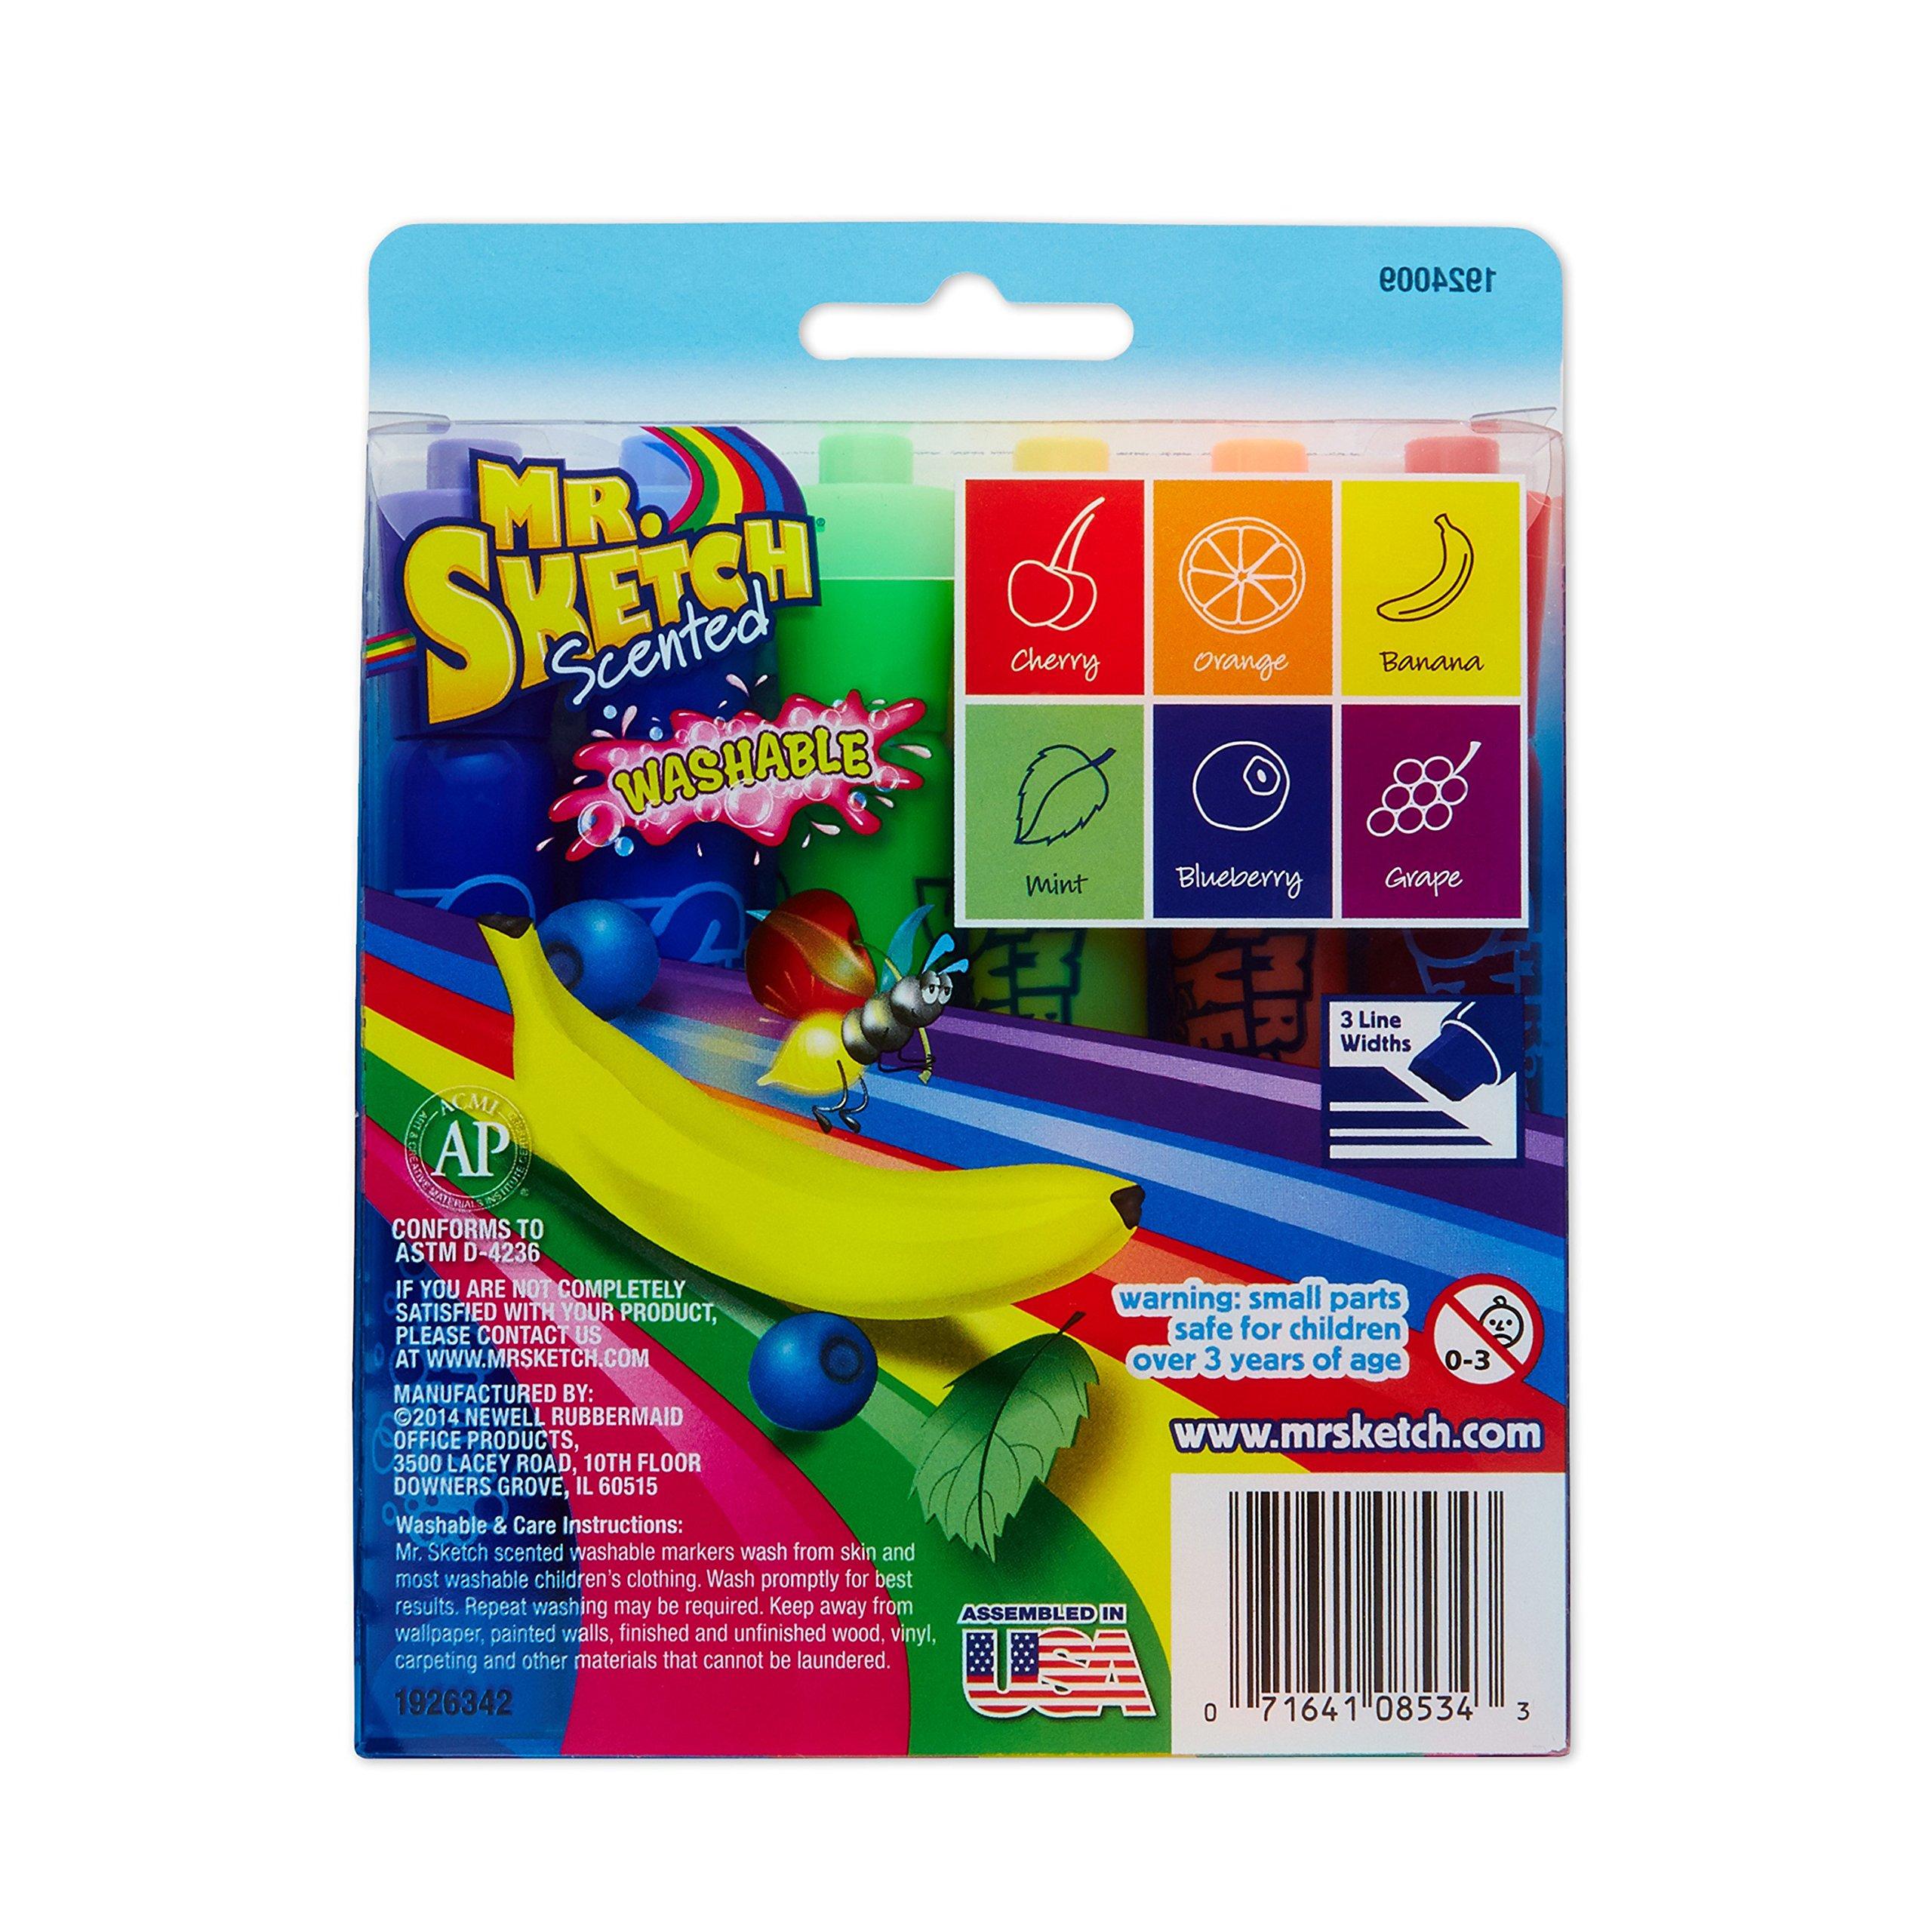 Mr. Sketch Scented Washable Markers, Chisel-Tip, Set of 6 by Mr. Sketch (Image #4)